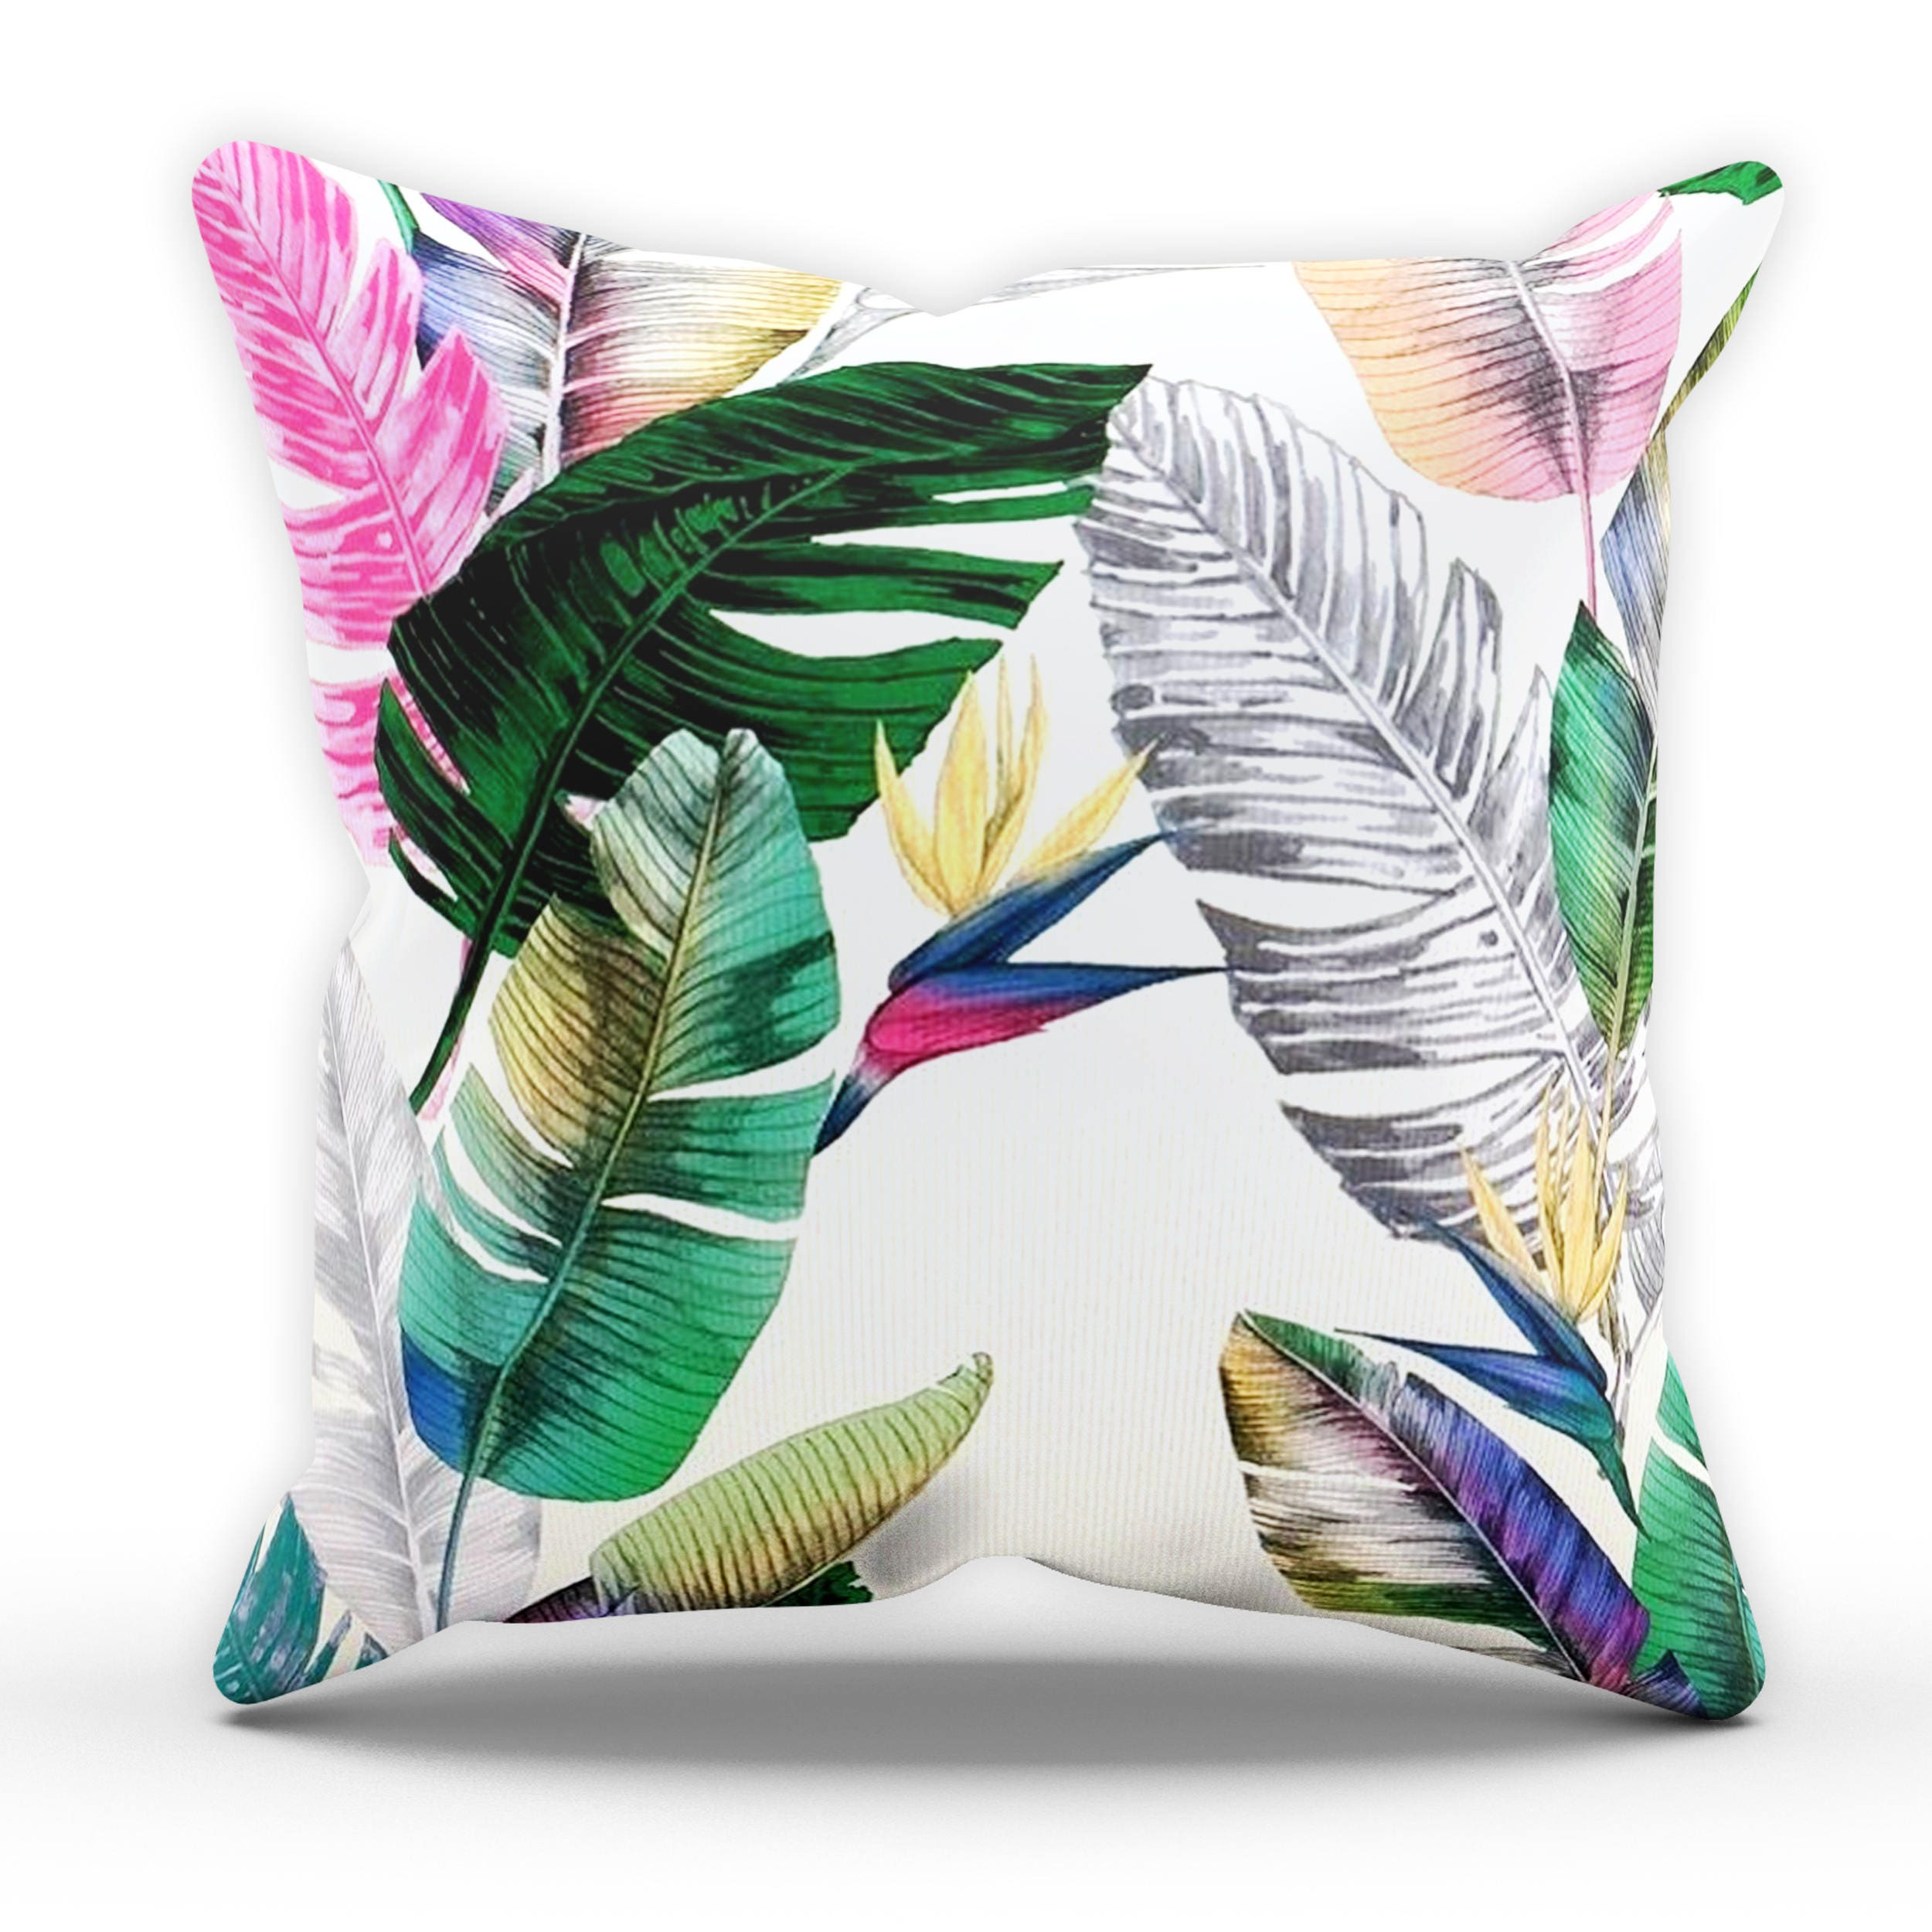 Neon Leaf Cushion Tropical Cushion Palm Leaf Cushion Garden